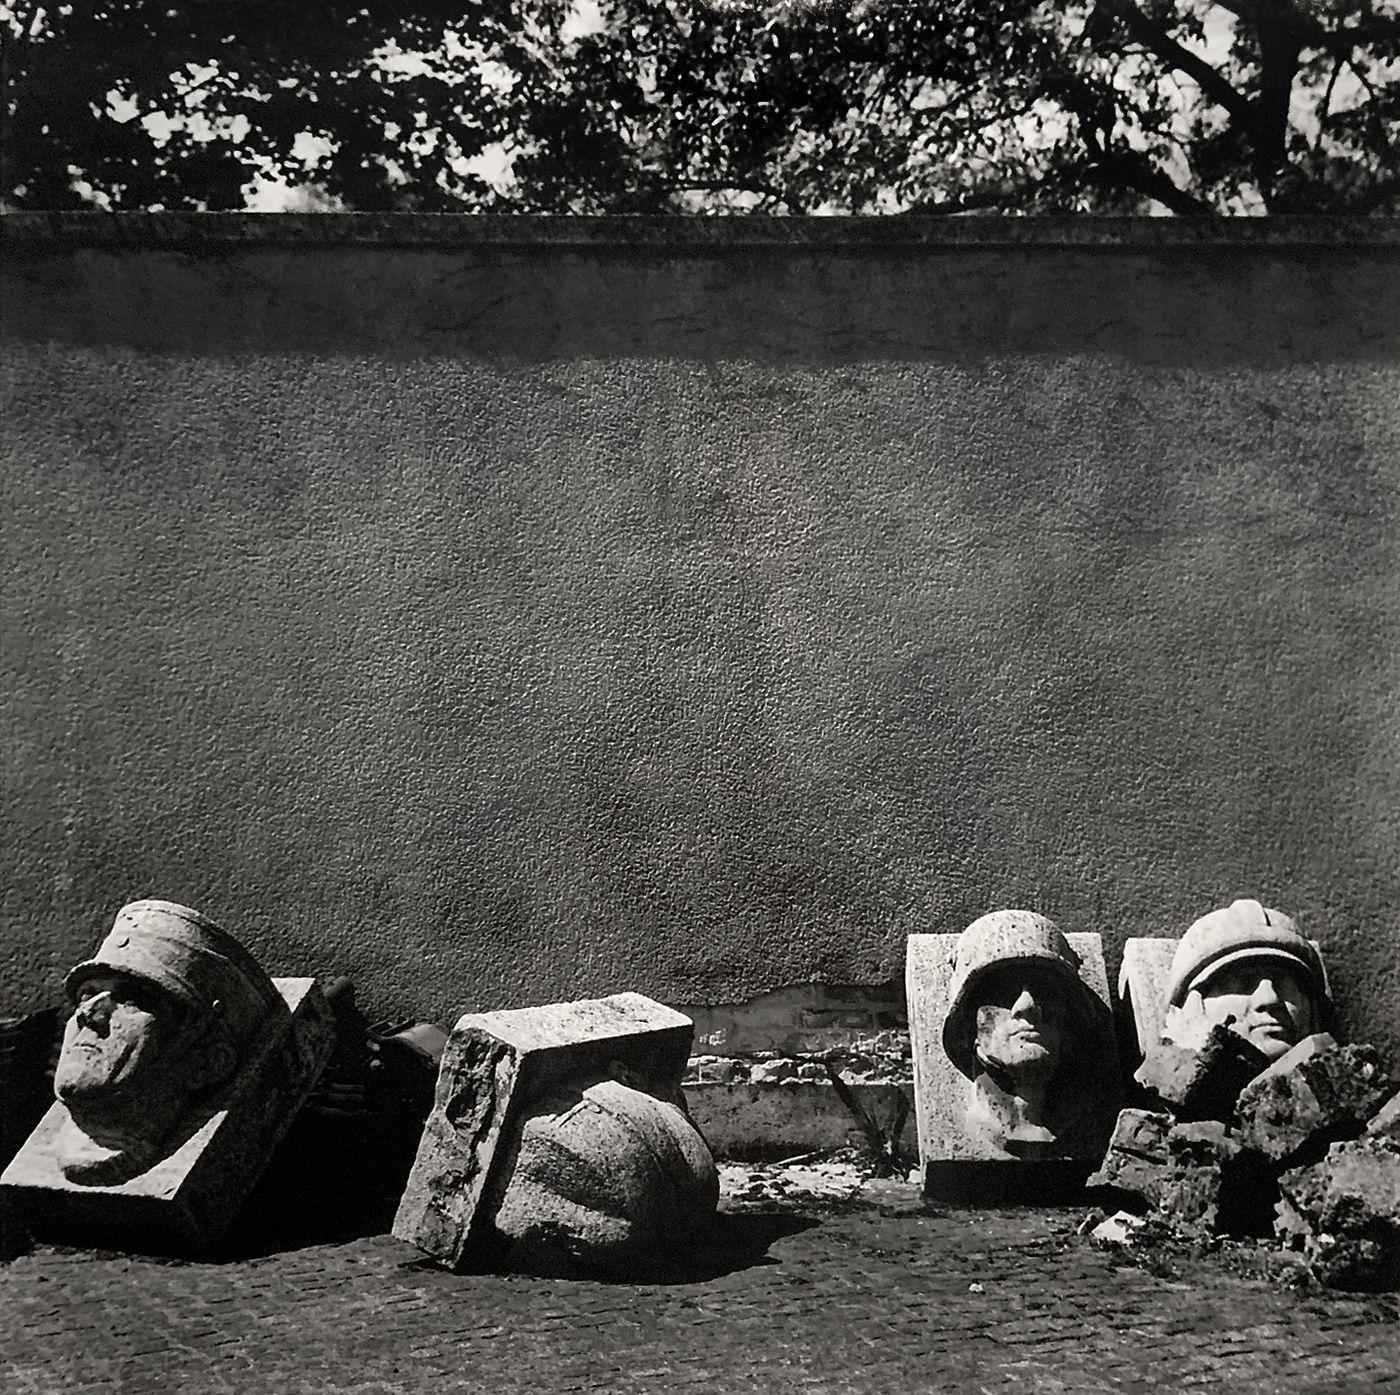 Exhibition 'Benjamin Katz Berlin Havelhöhe, 1960/61' at